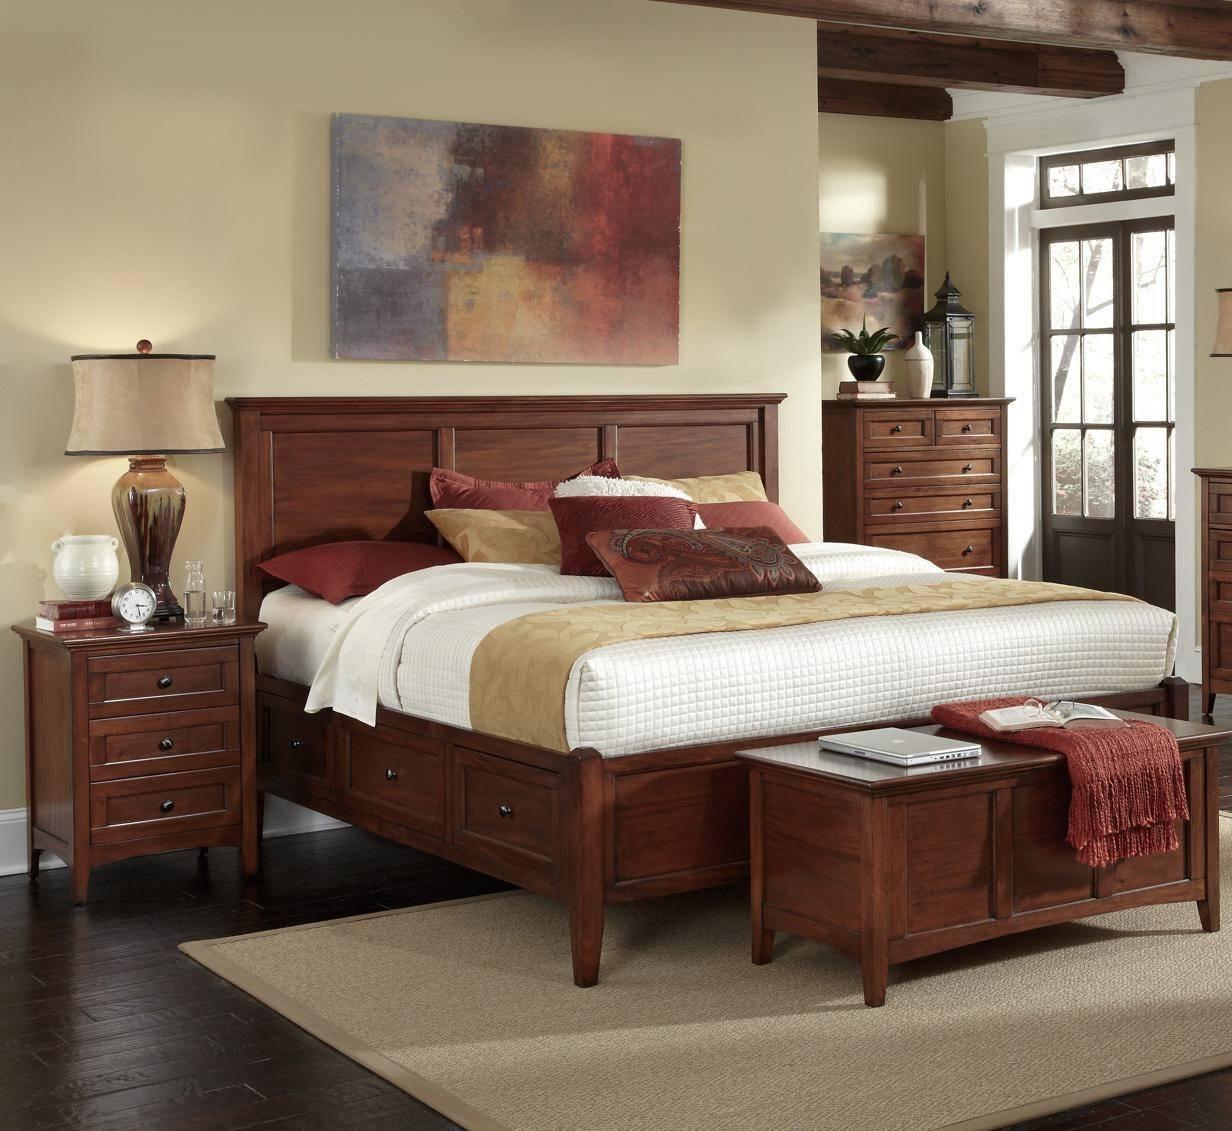 A America Westlake Queen Storage Bedroom Set 3 Pcs in Brown, Cherry, Wood